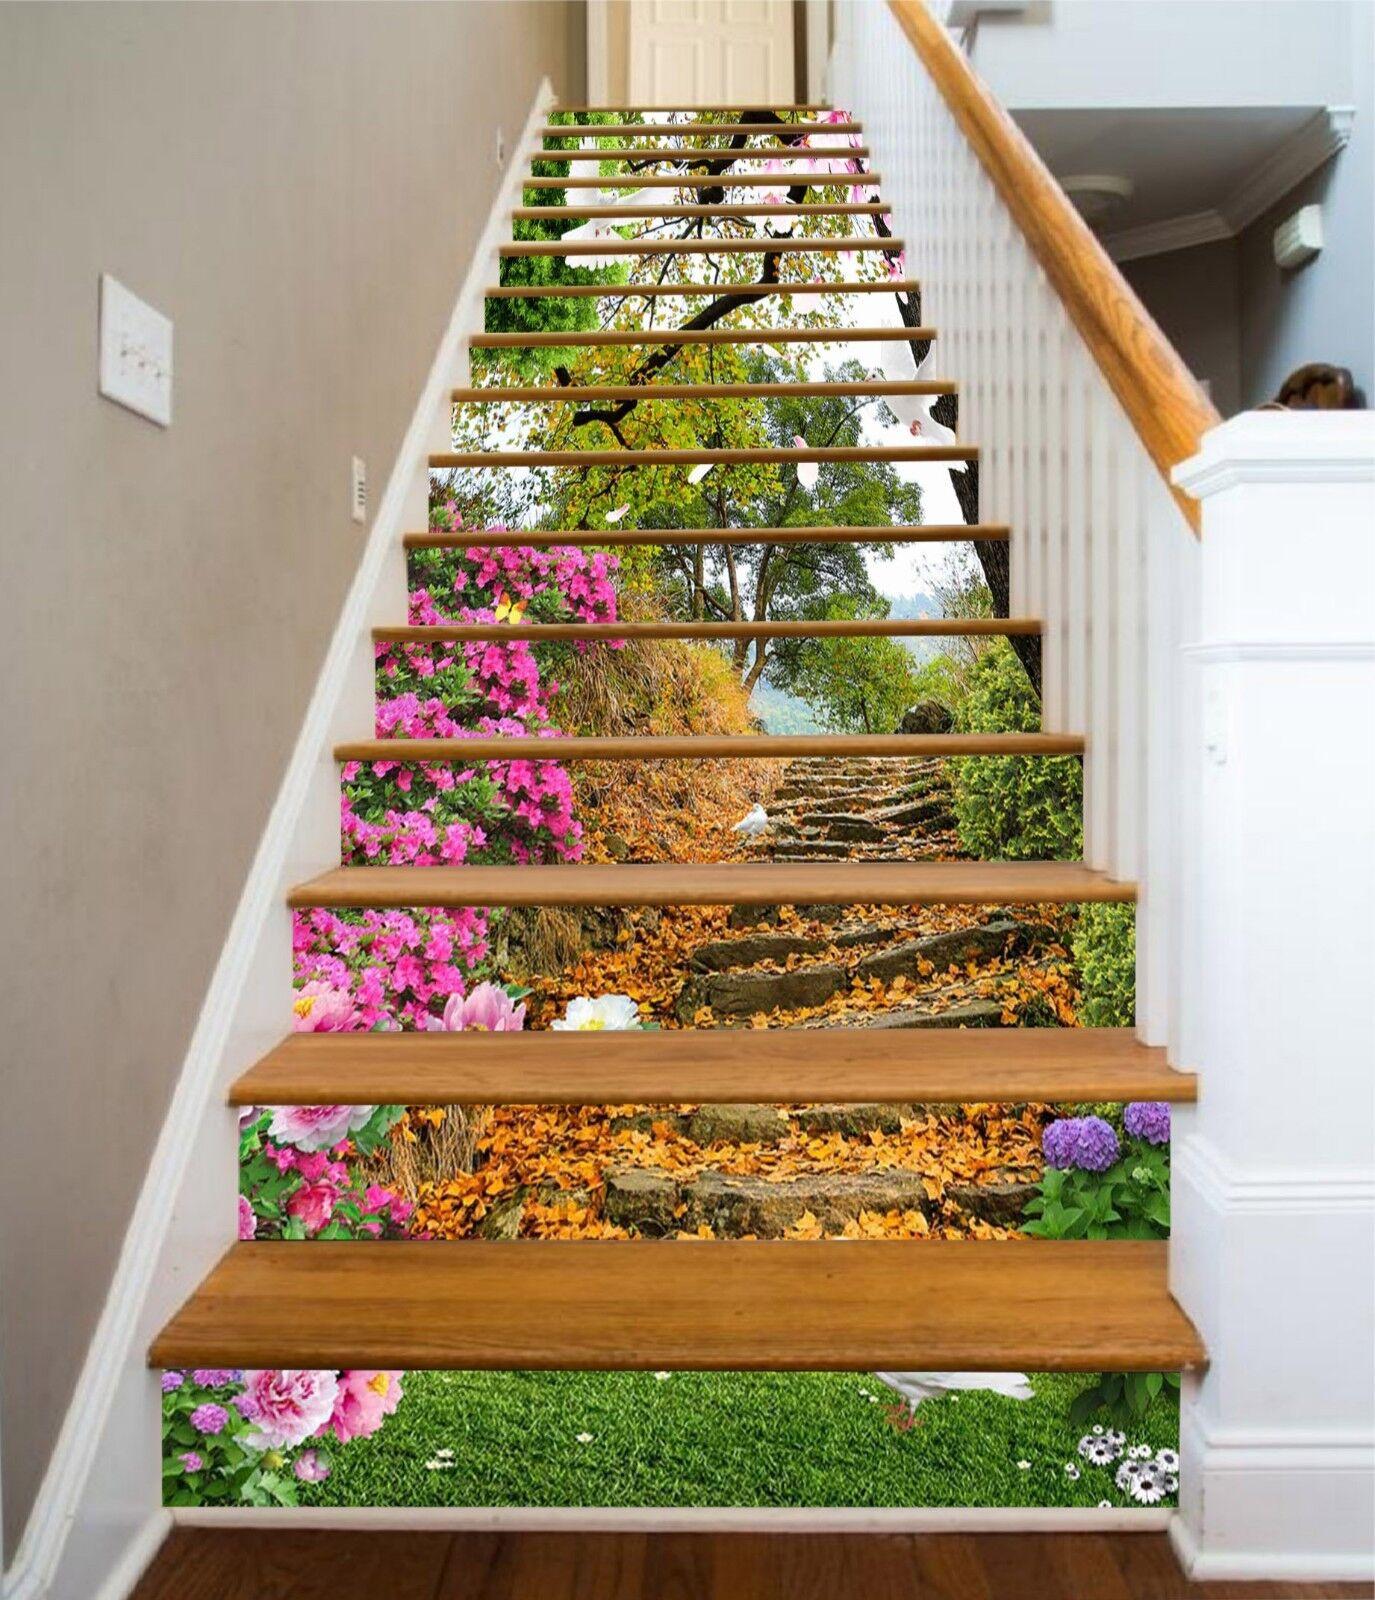 3D Flowers Steps Stair Risers Decoration Photo Mural Vinyl Decal Wallpaper UK